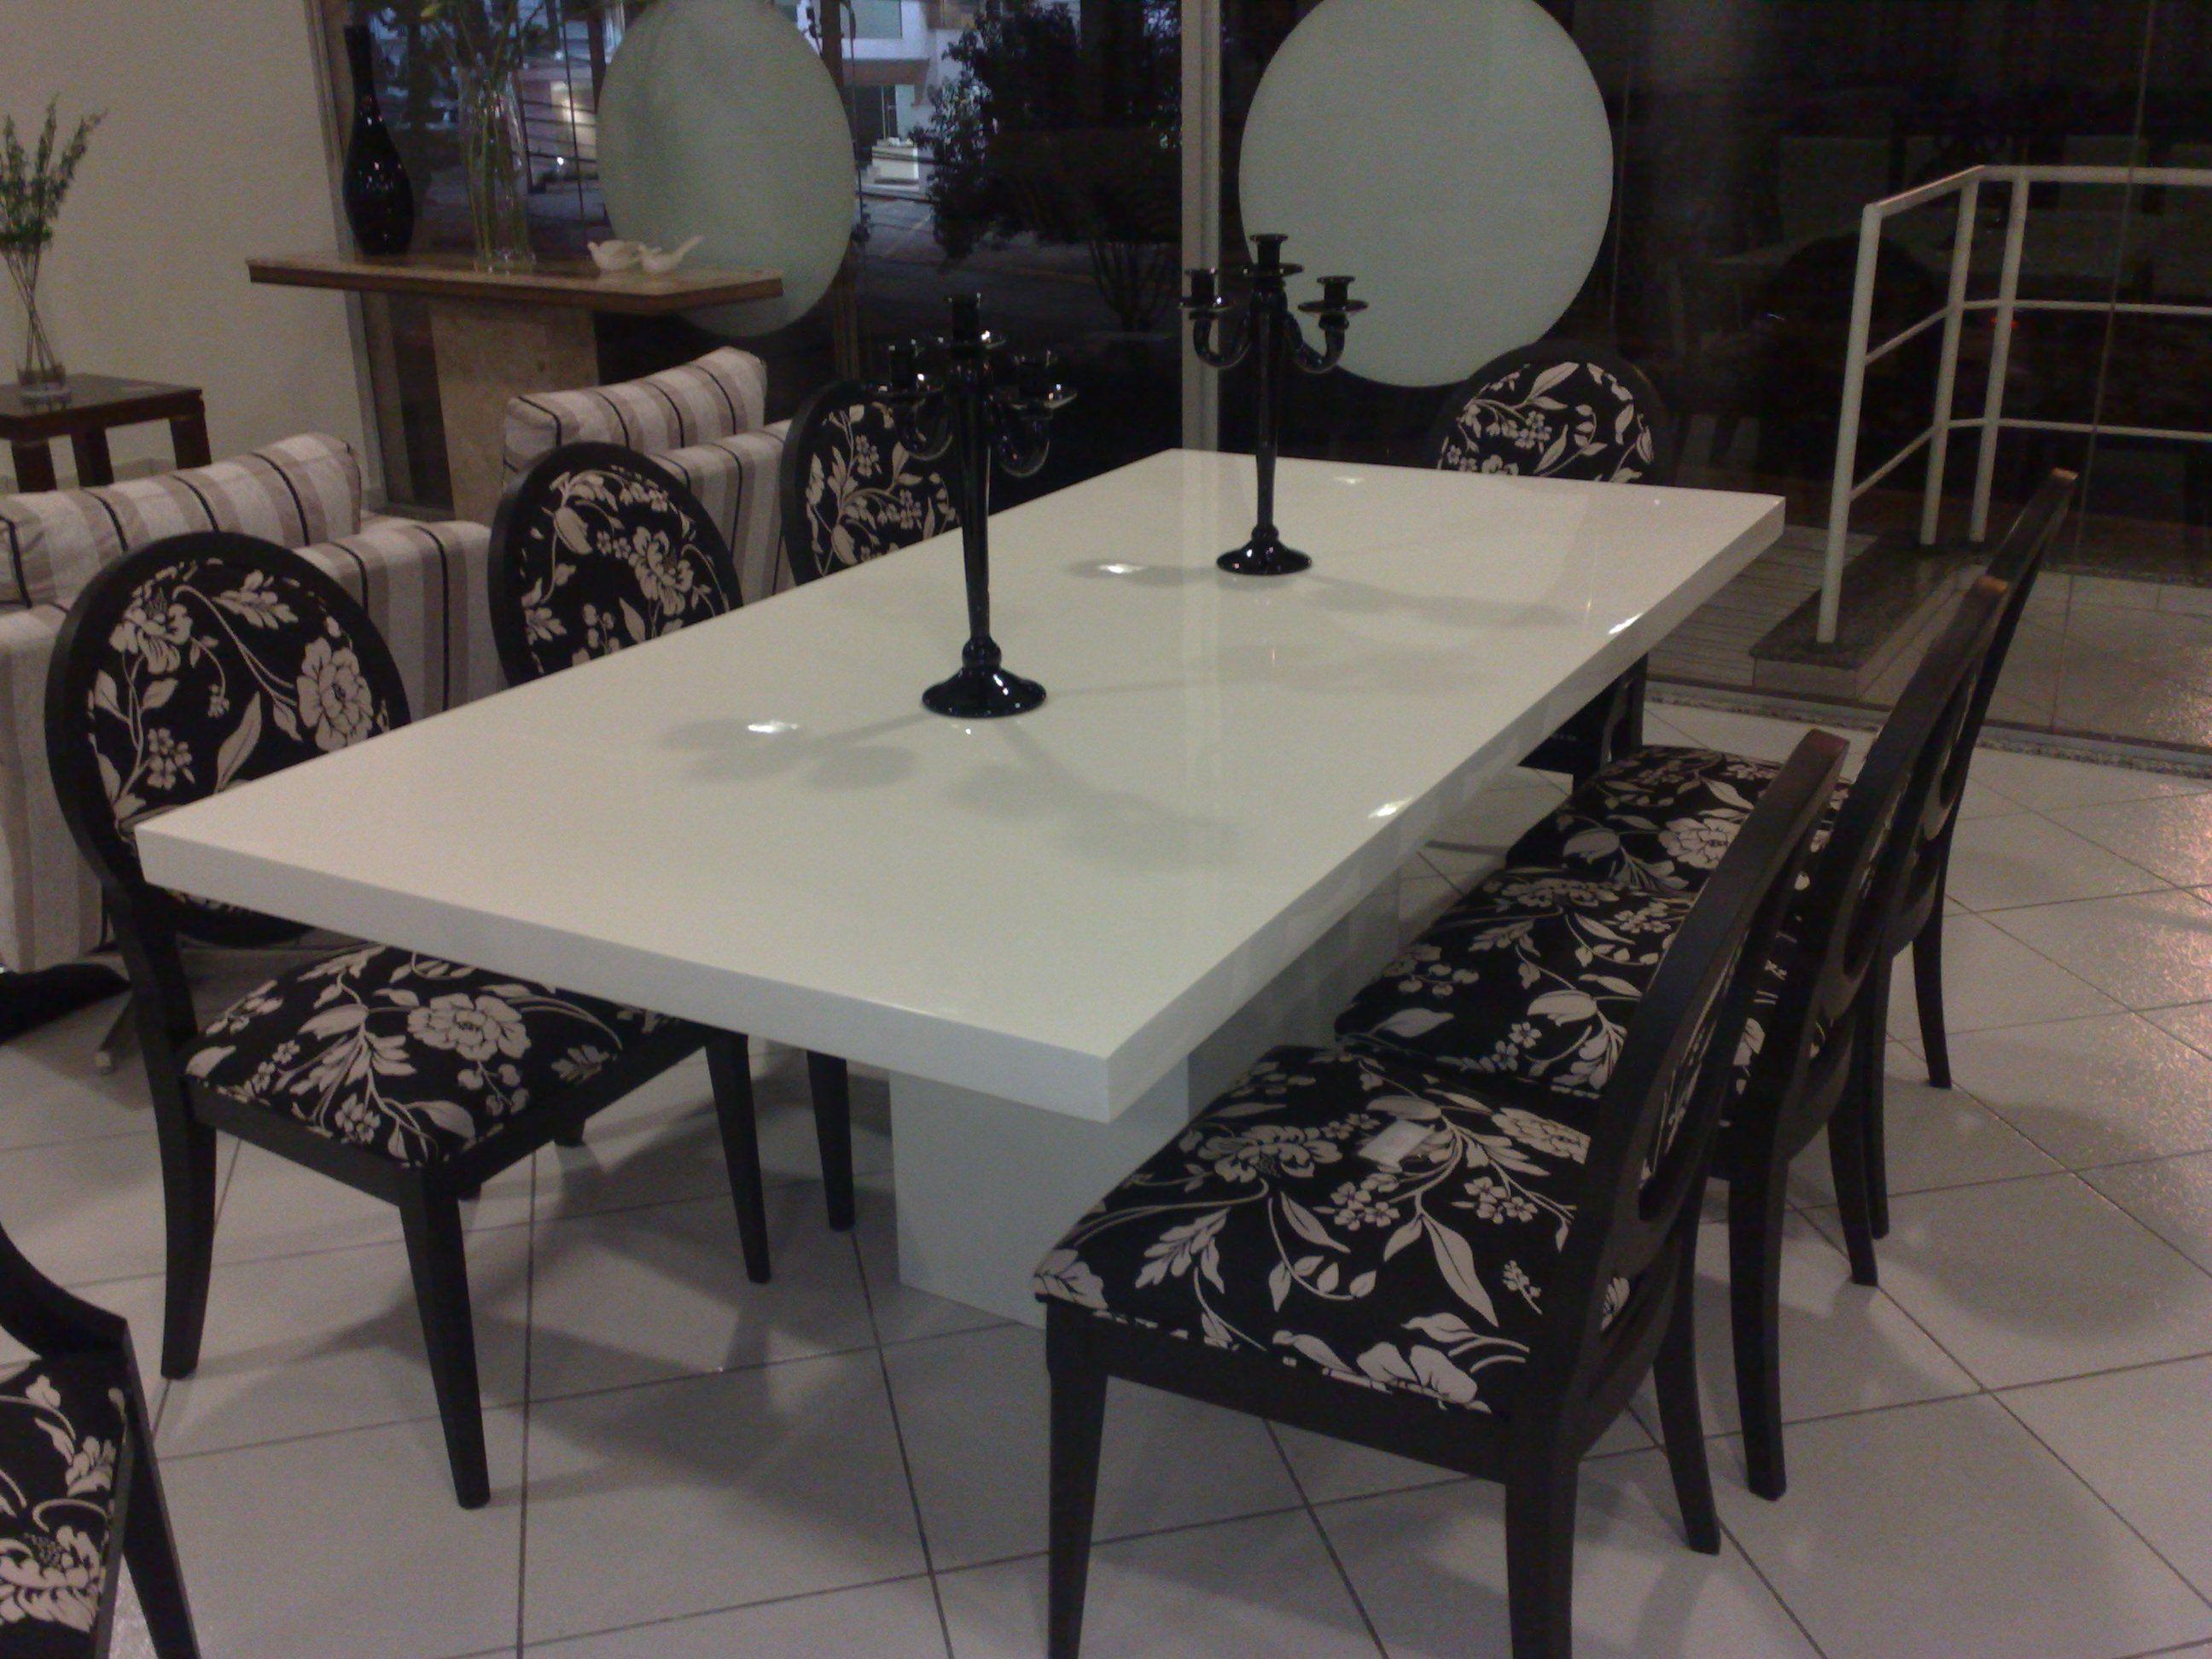 Mesa De Jantar Em M Rmore Resinada Sala De Jantar Pinterest  -> Sala De Jantar Pequena Com Mesa De Marmore